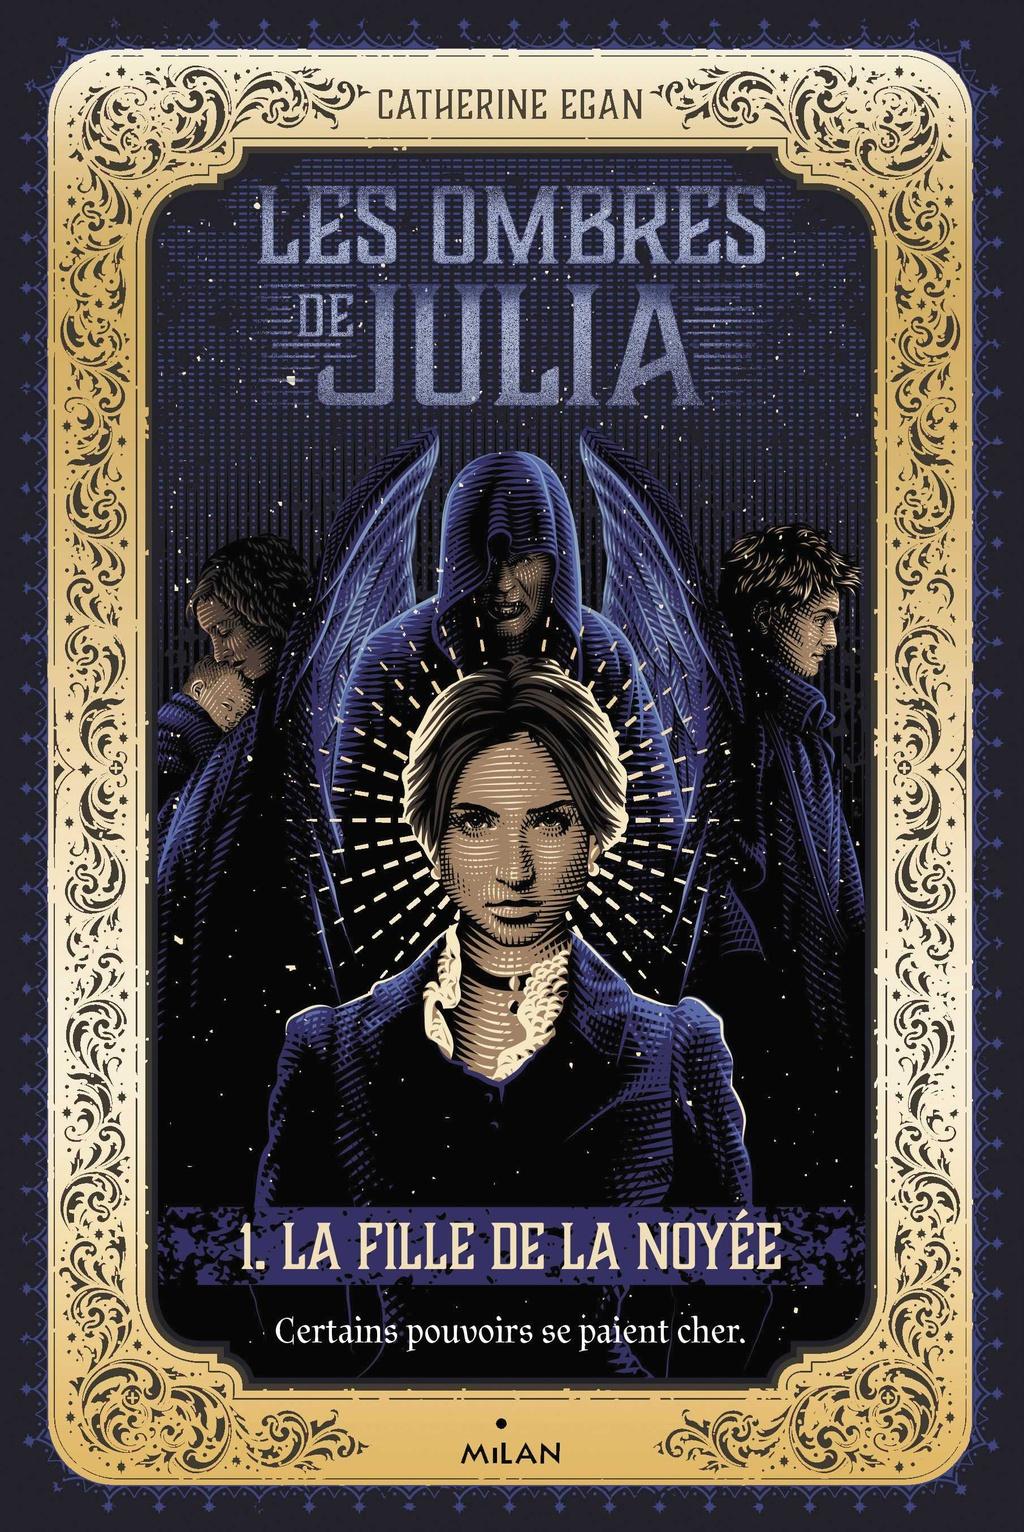 Image de l'article «Les ombres de Julia de Catherine Egan»